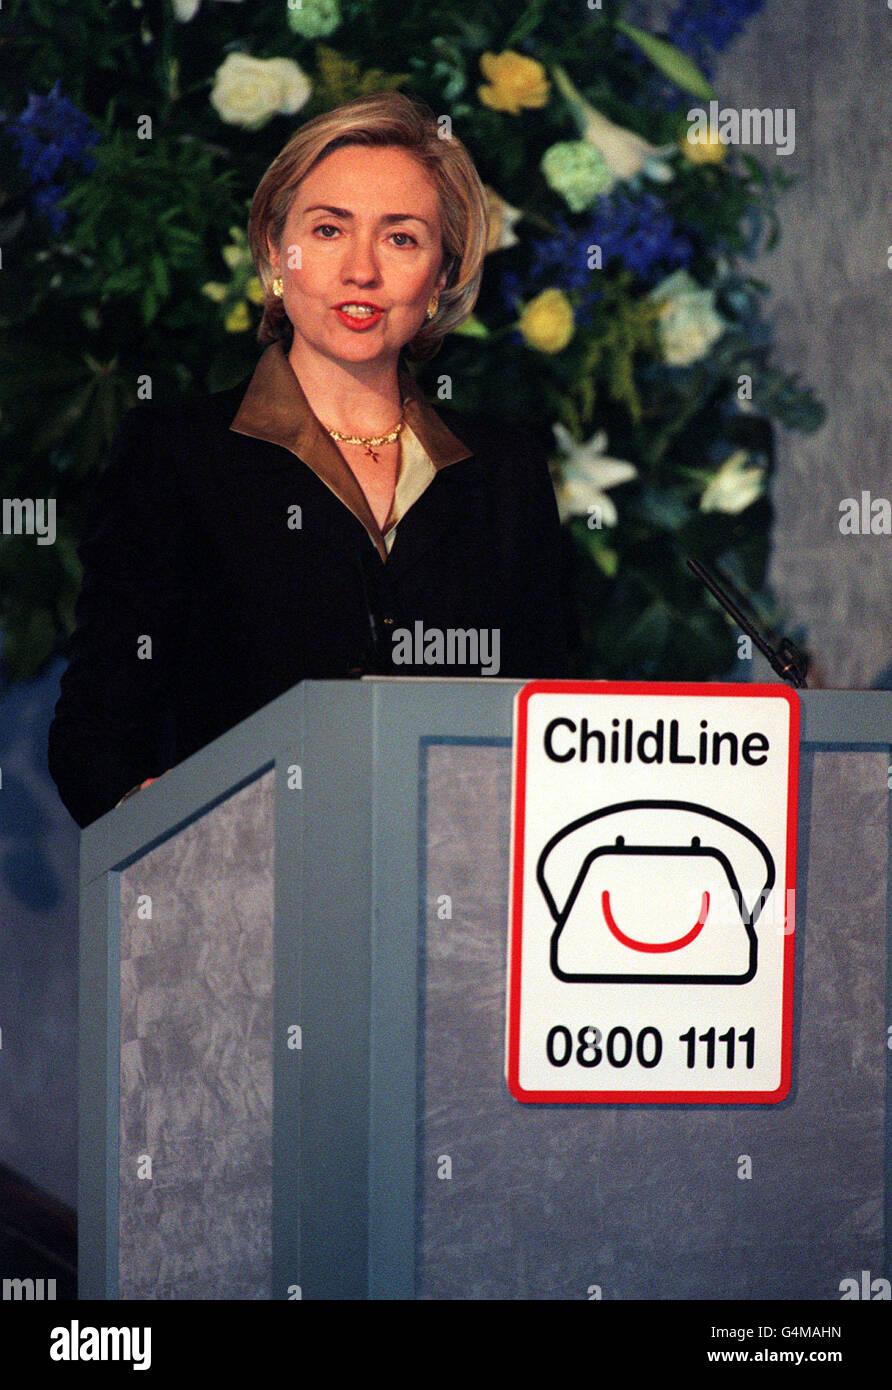 ChildLine/Hillary Clinton speech Stock Photo